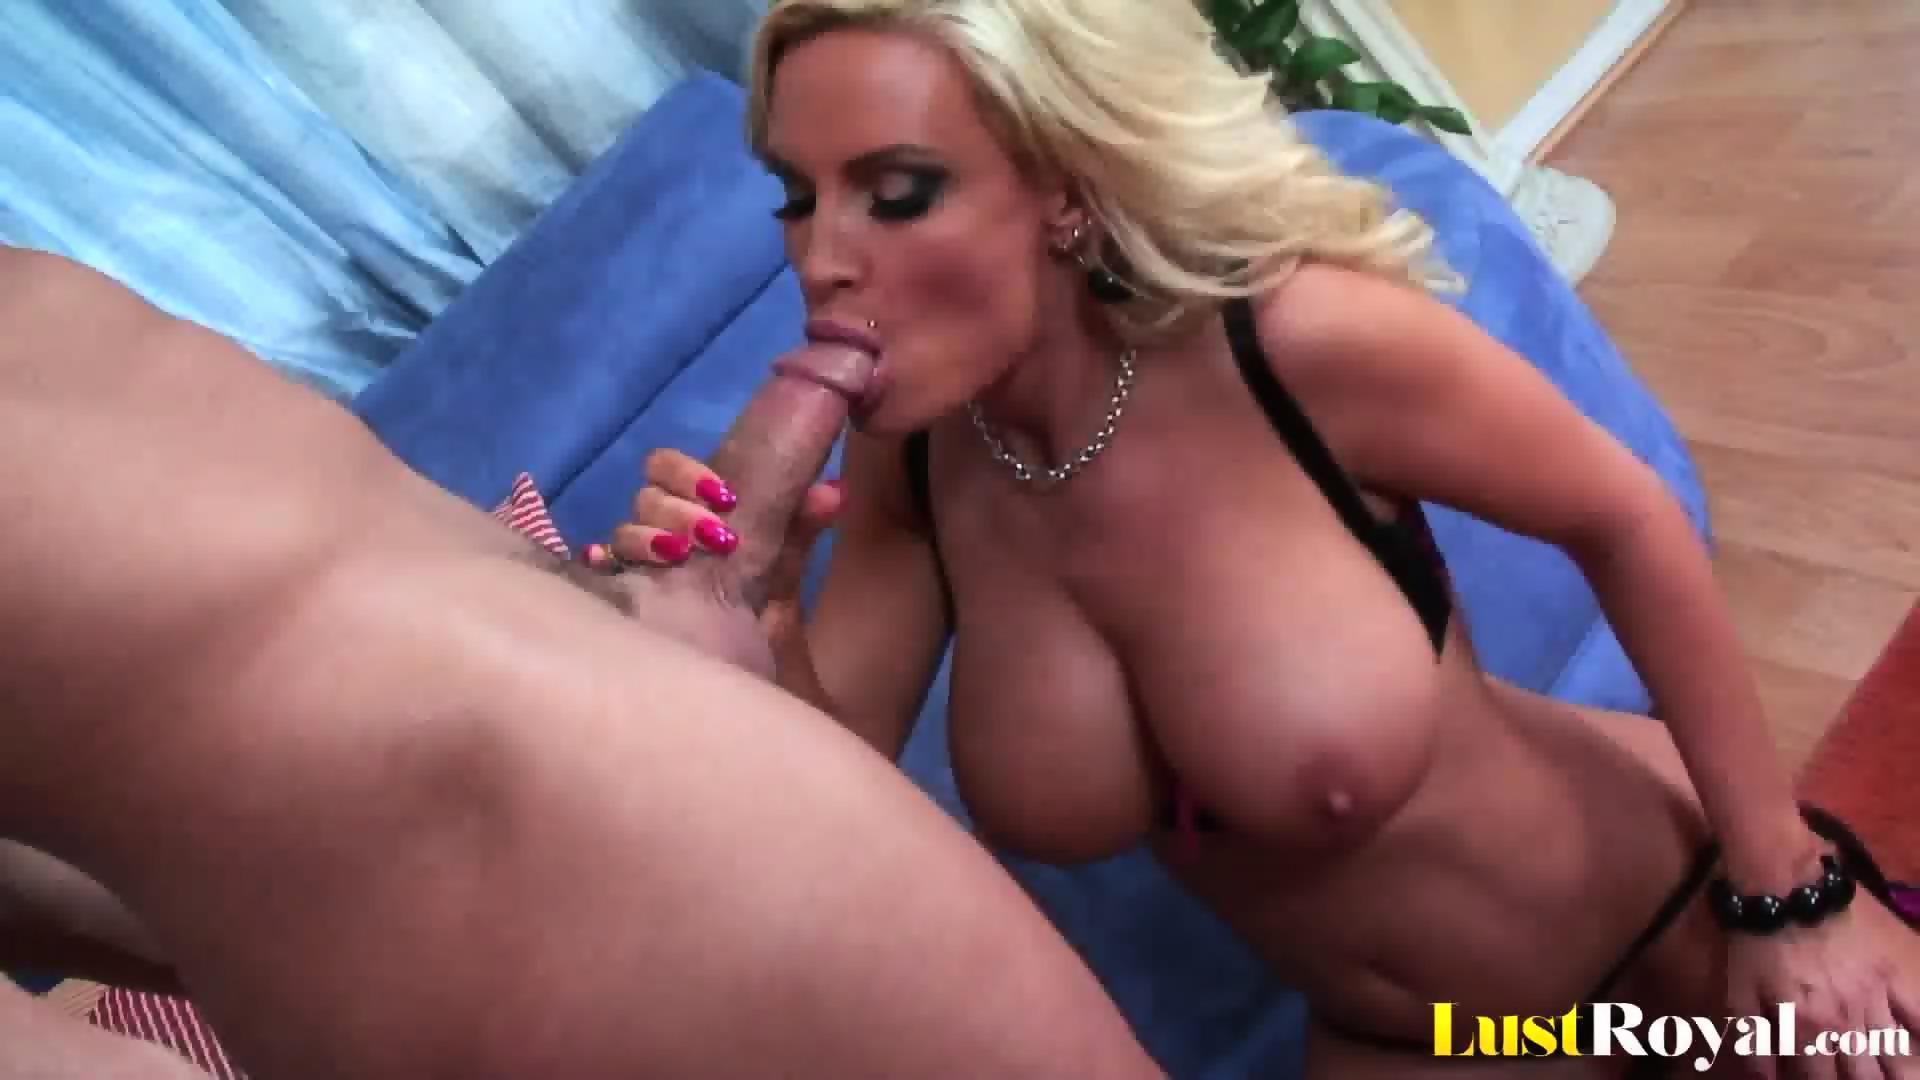 Free lex sabre porn videos